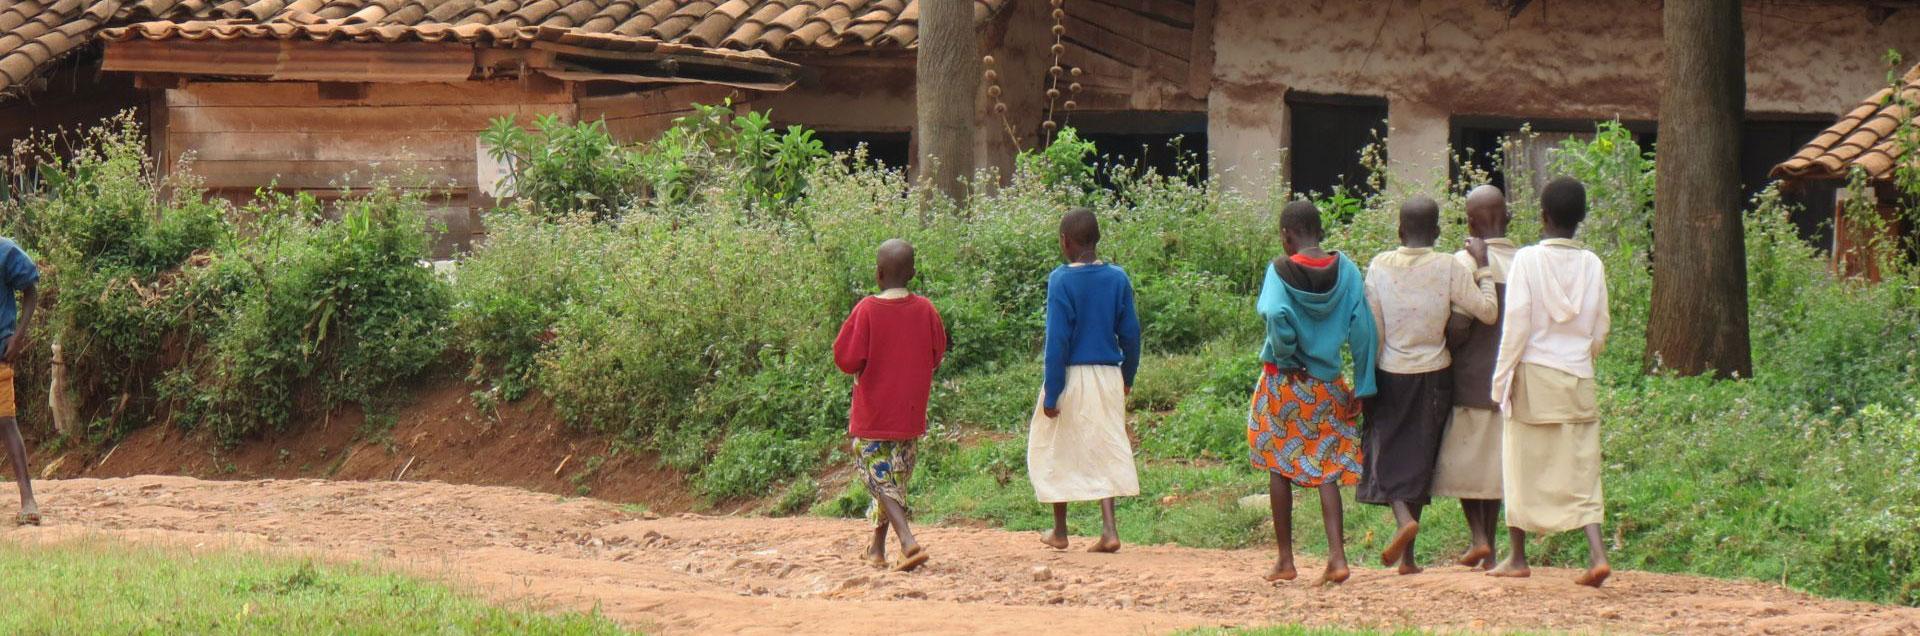 mejora-oportunidades-mujeres-burundi